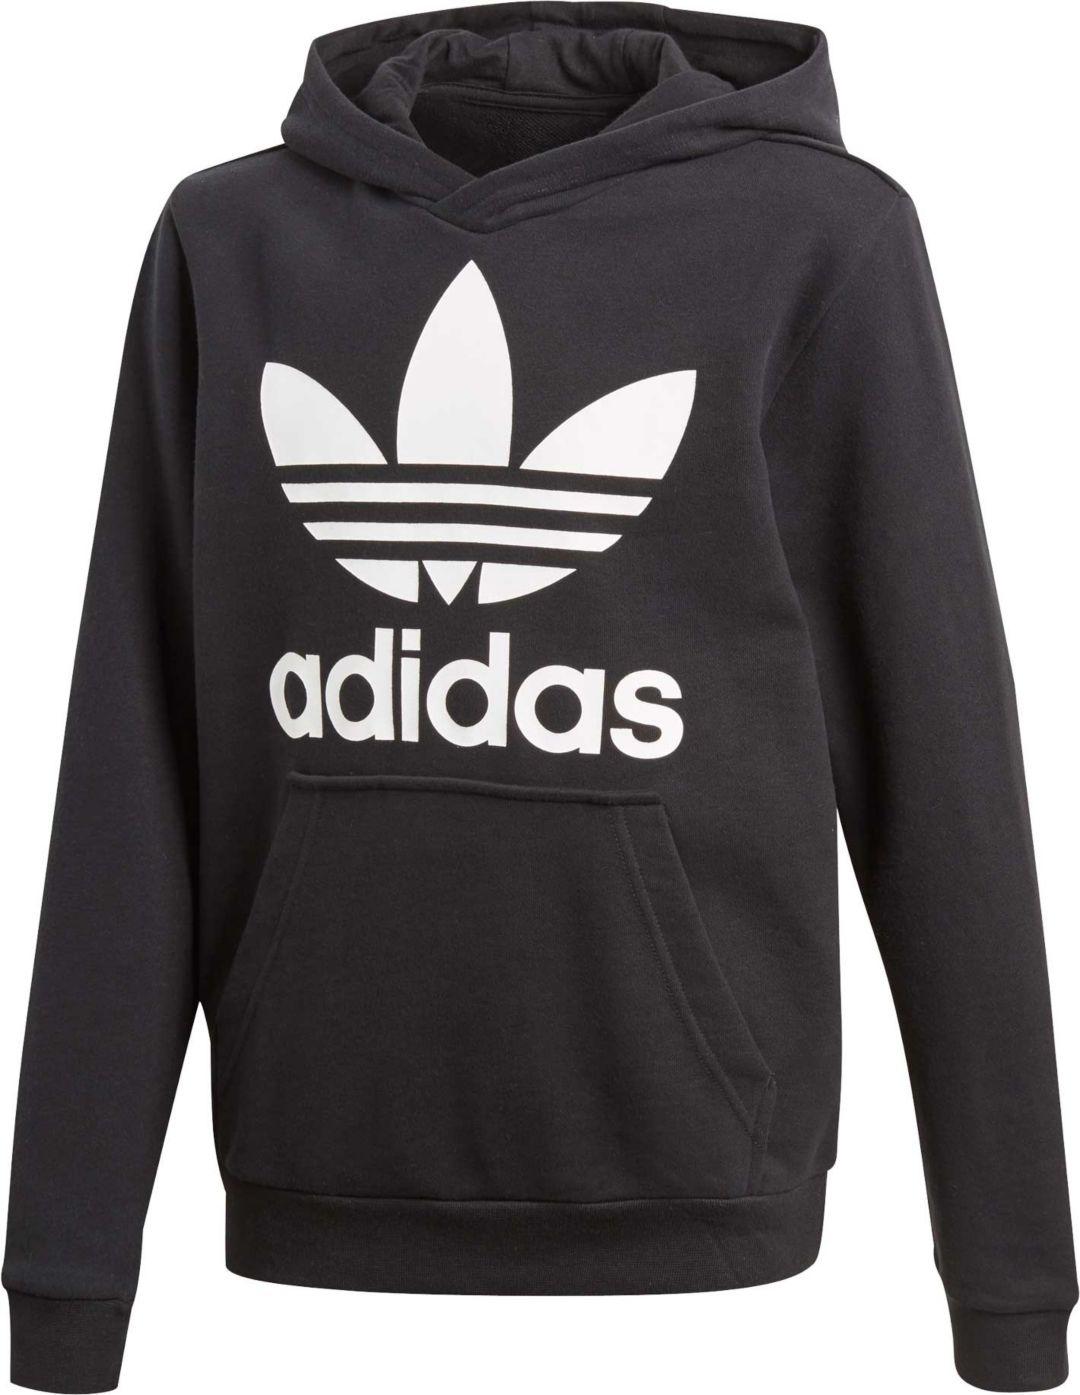 30b4297b96f63 adidas Originals Boys' Trefoil Hoodie